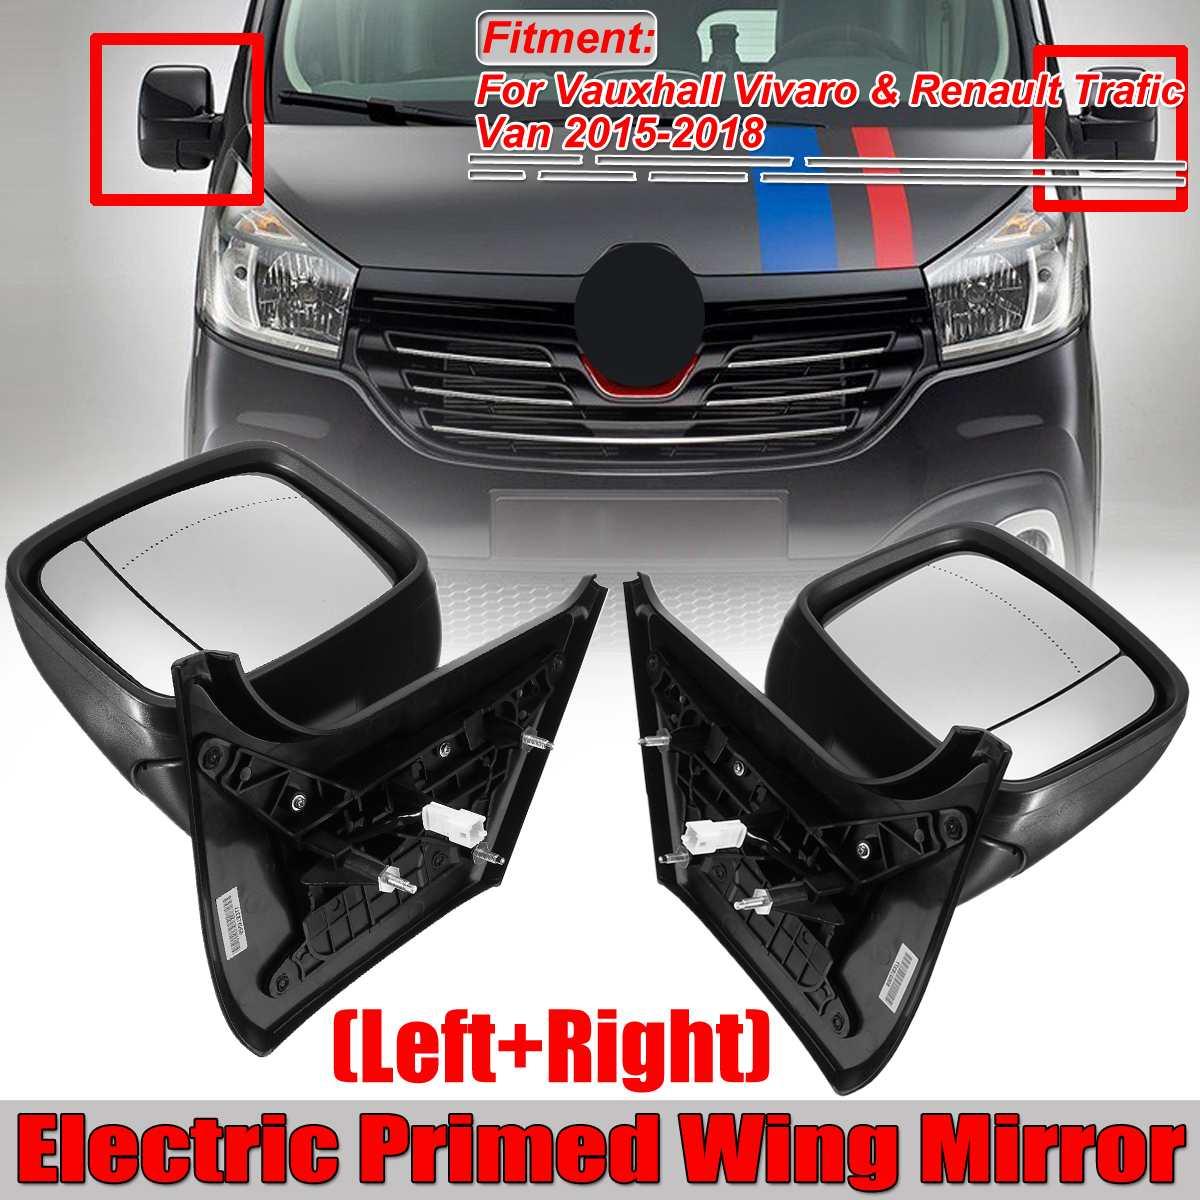 1xElectric Primed Wing Mirror Black Car Rearview Side Mirror For Vauxhall Vivaro & Renault Trafic Van 2015-2018 Rear View Mirror